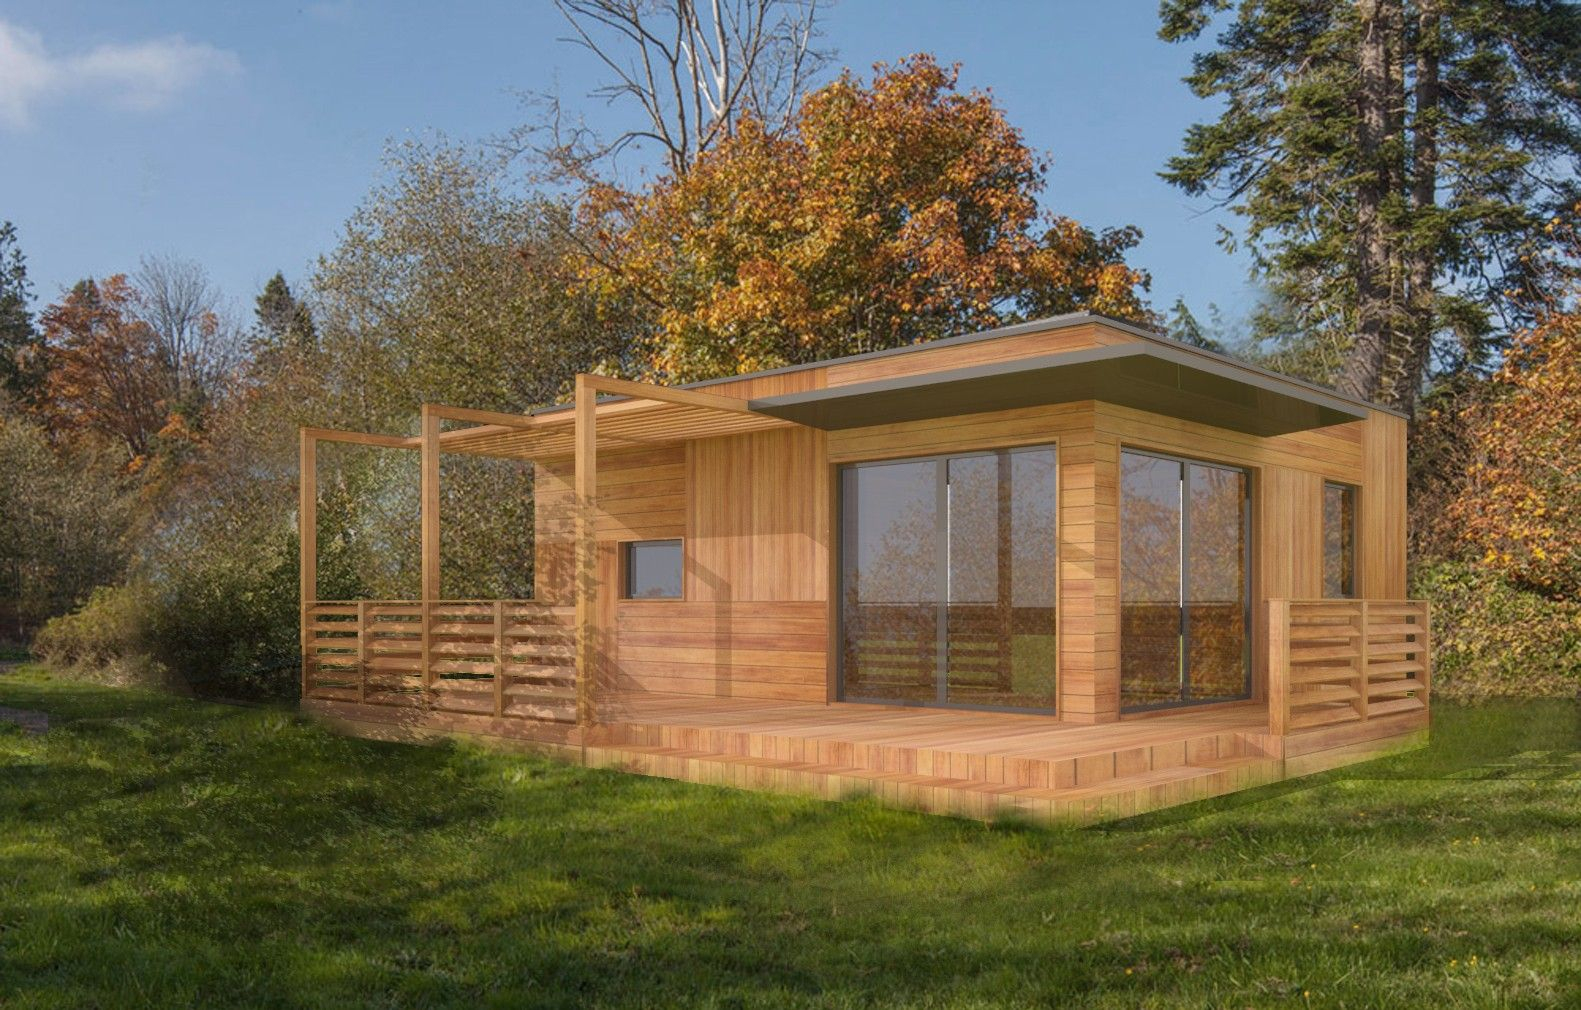 Plan Studio 35M2 Clé En Main | Chalet En Bois Habitable ... dedans Studio De Jardin Habitable